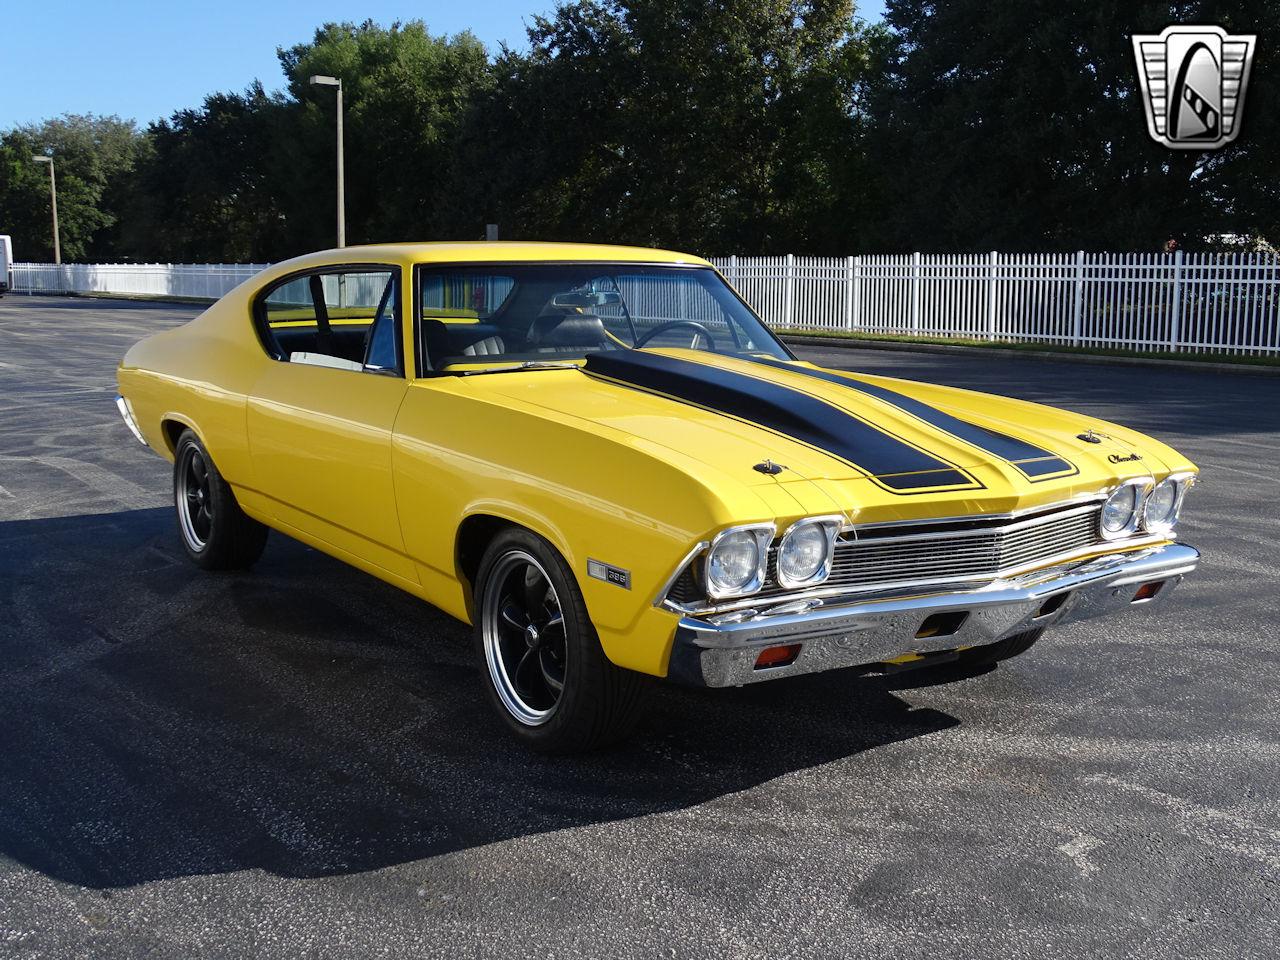 1968 Chevrolet Chevelle 20